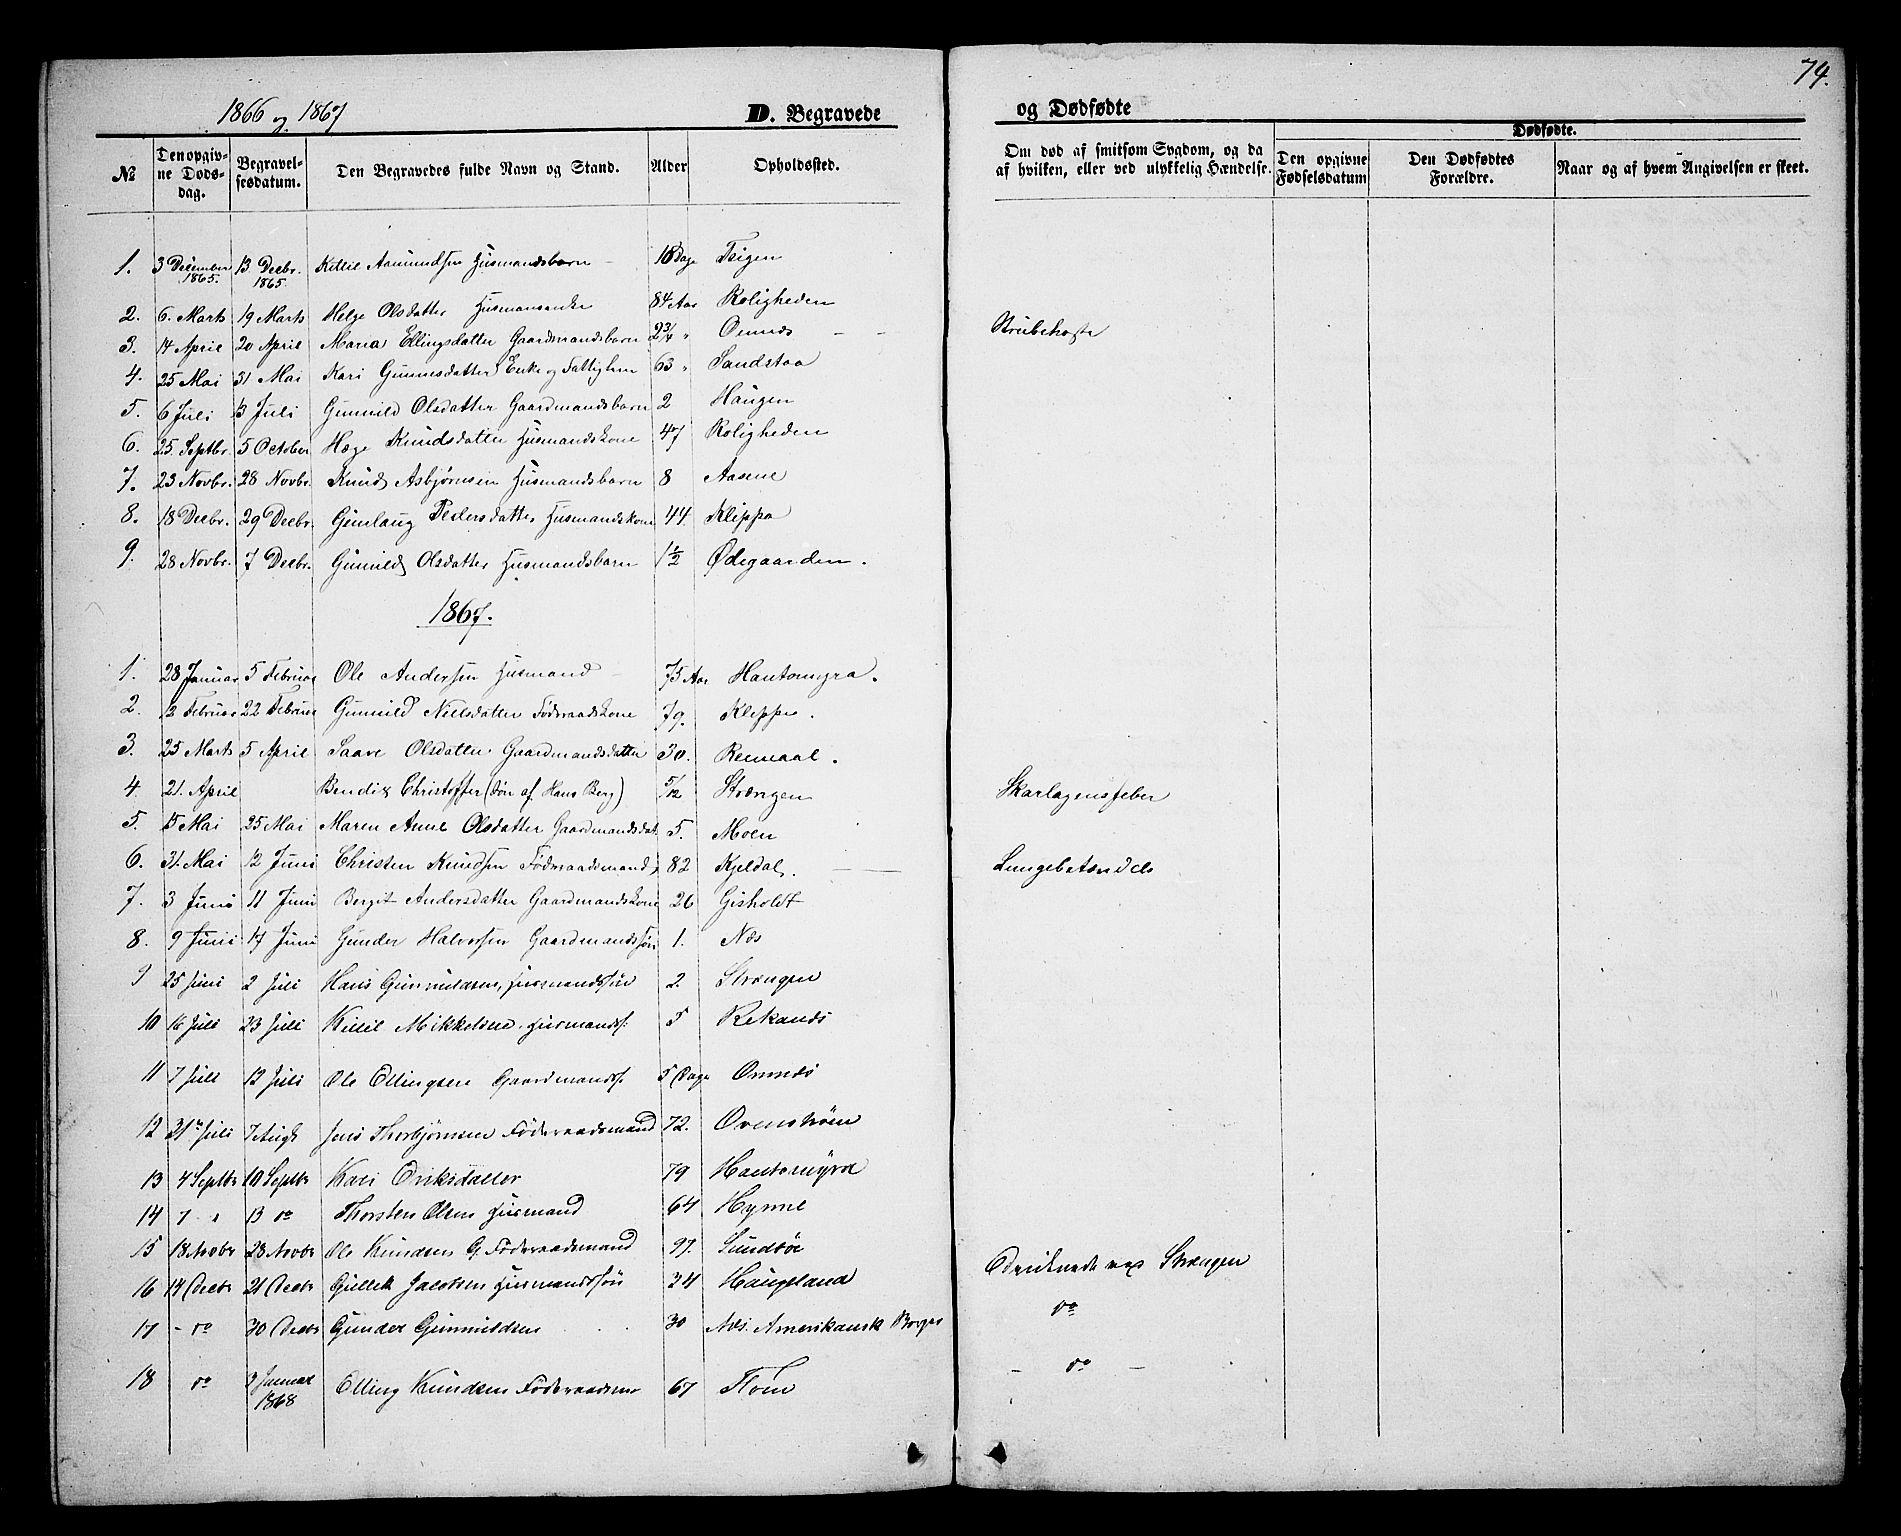 SAKO, Lunde kirkebøker, G/Gb/L0001: Klokkerbok nr. II 1, 1866-1887, s. 74